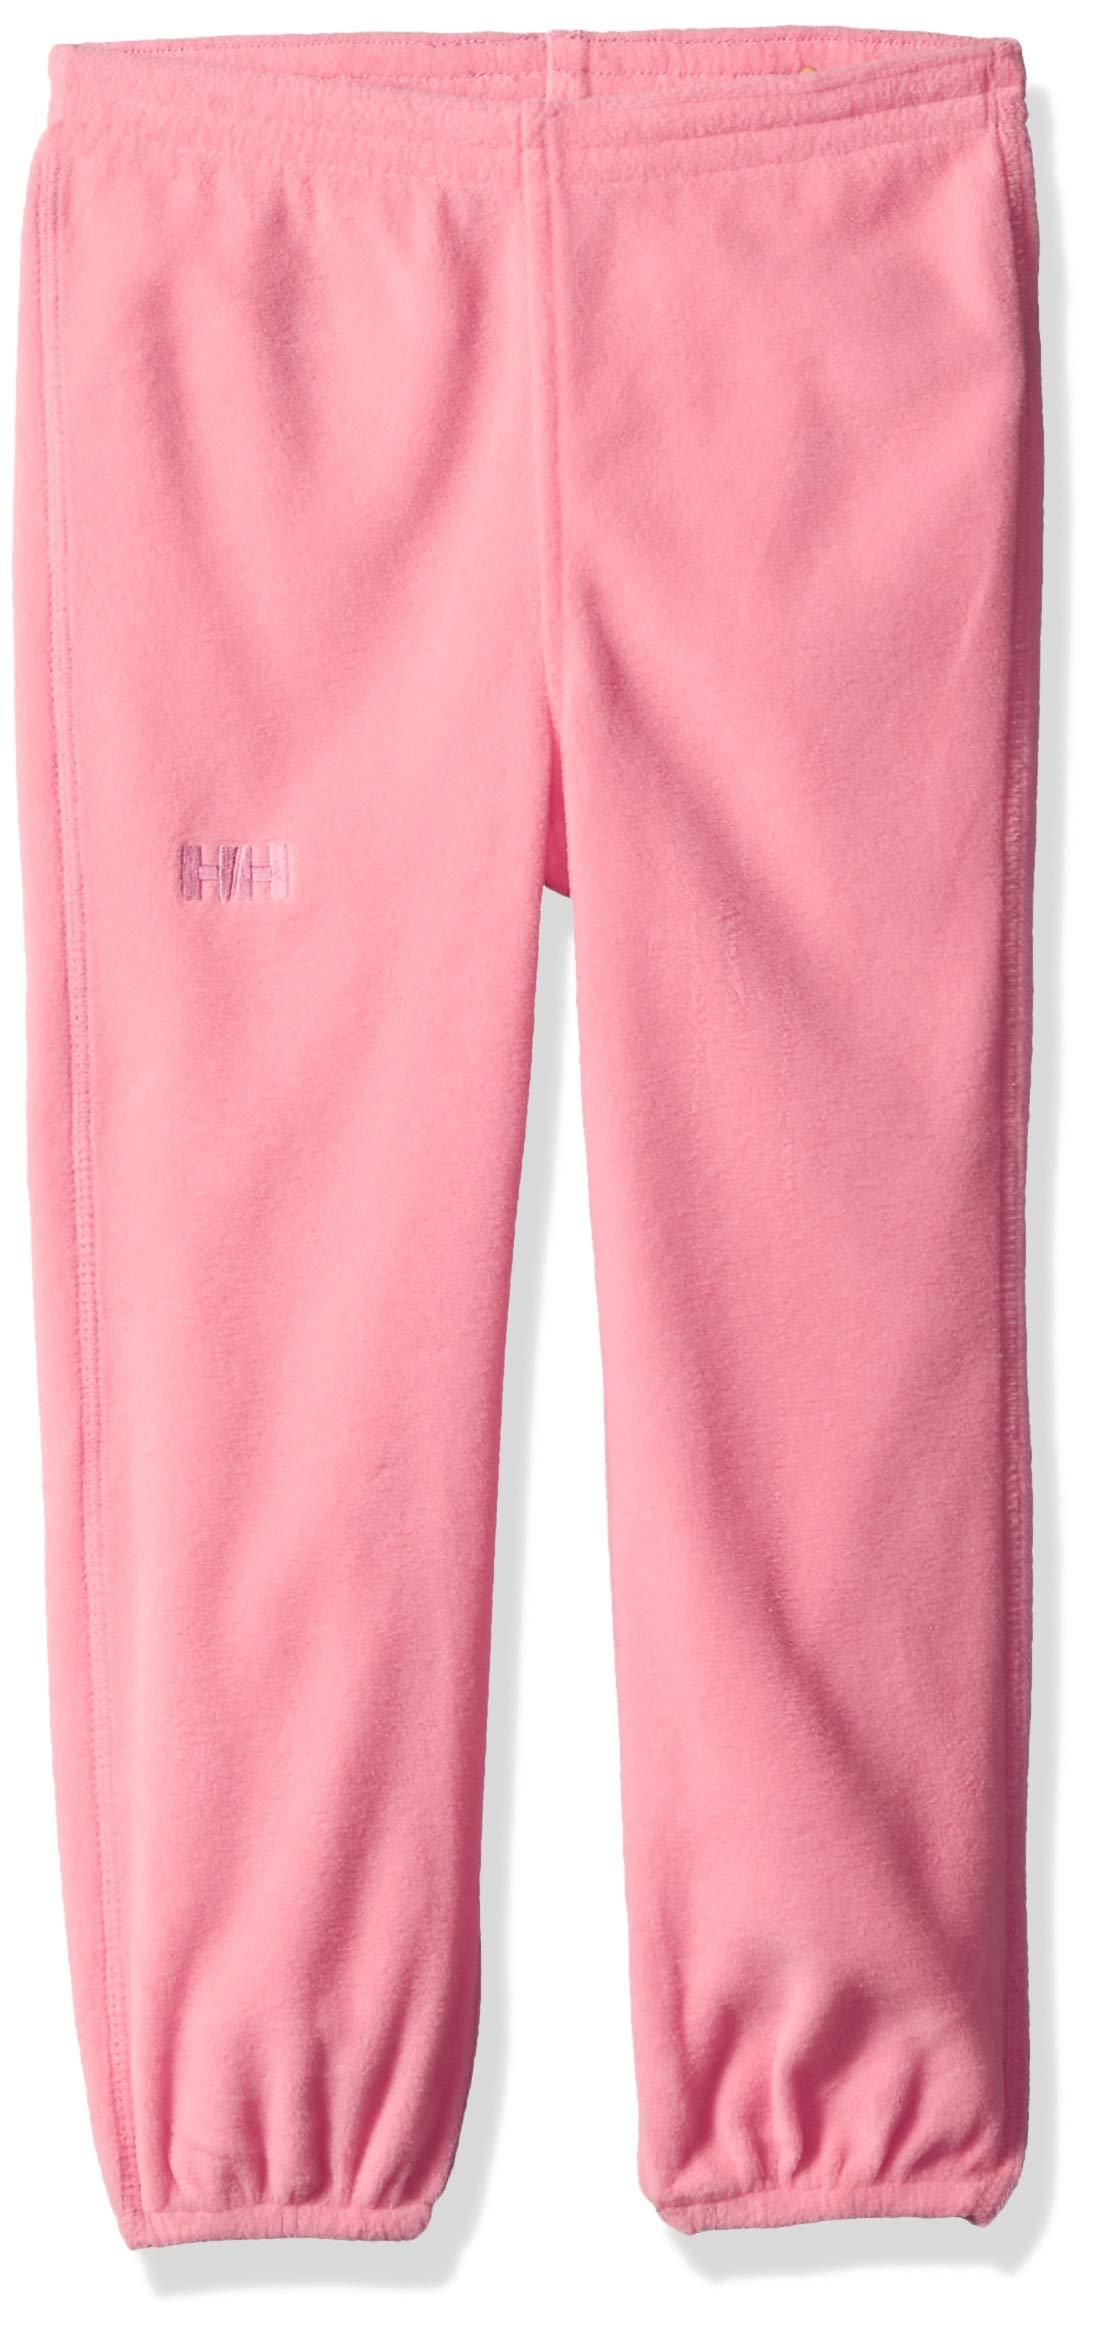 Helly Hansen K Daybreaker Fleece Pant, Strawberry Pink, Size 7